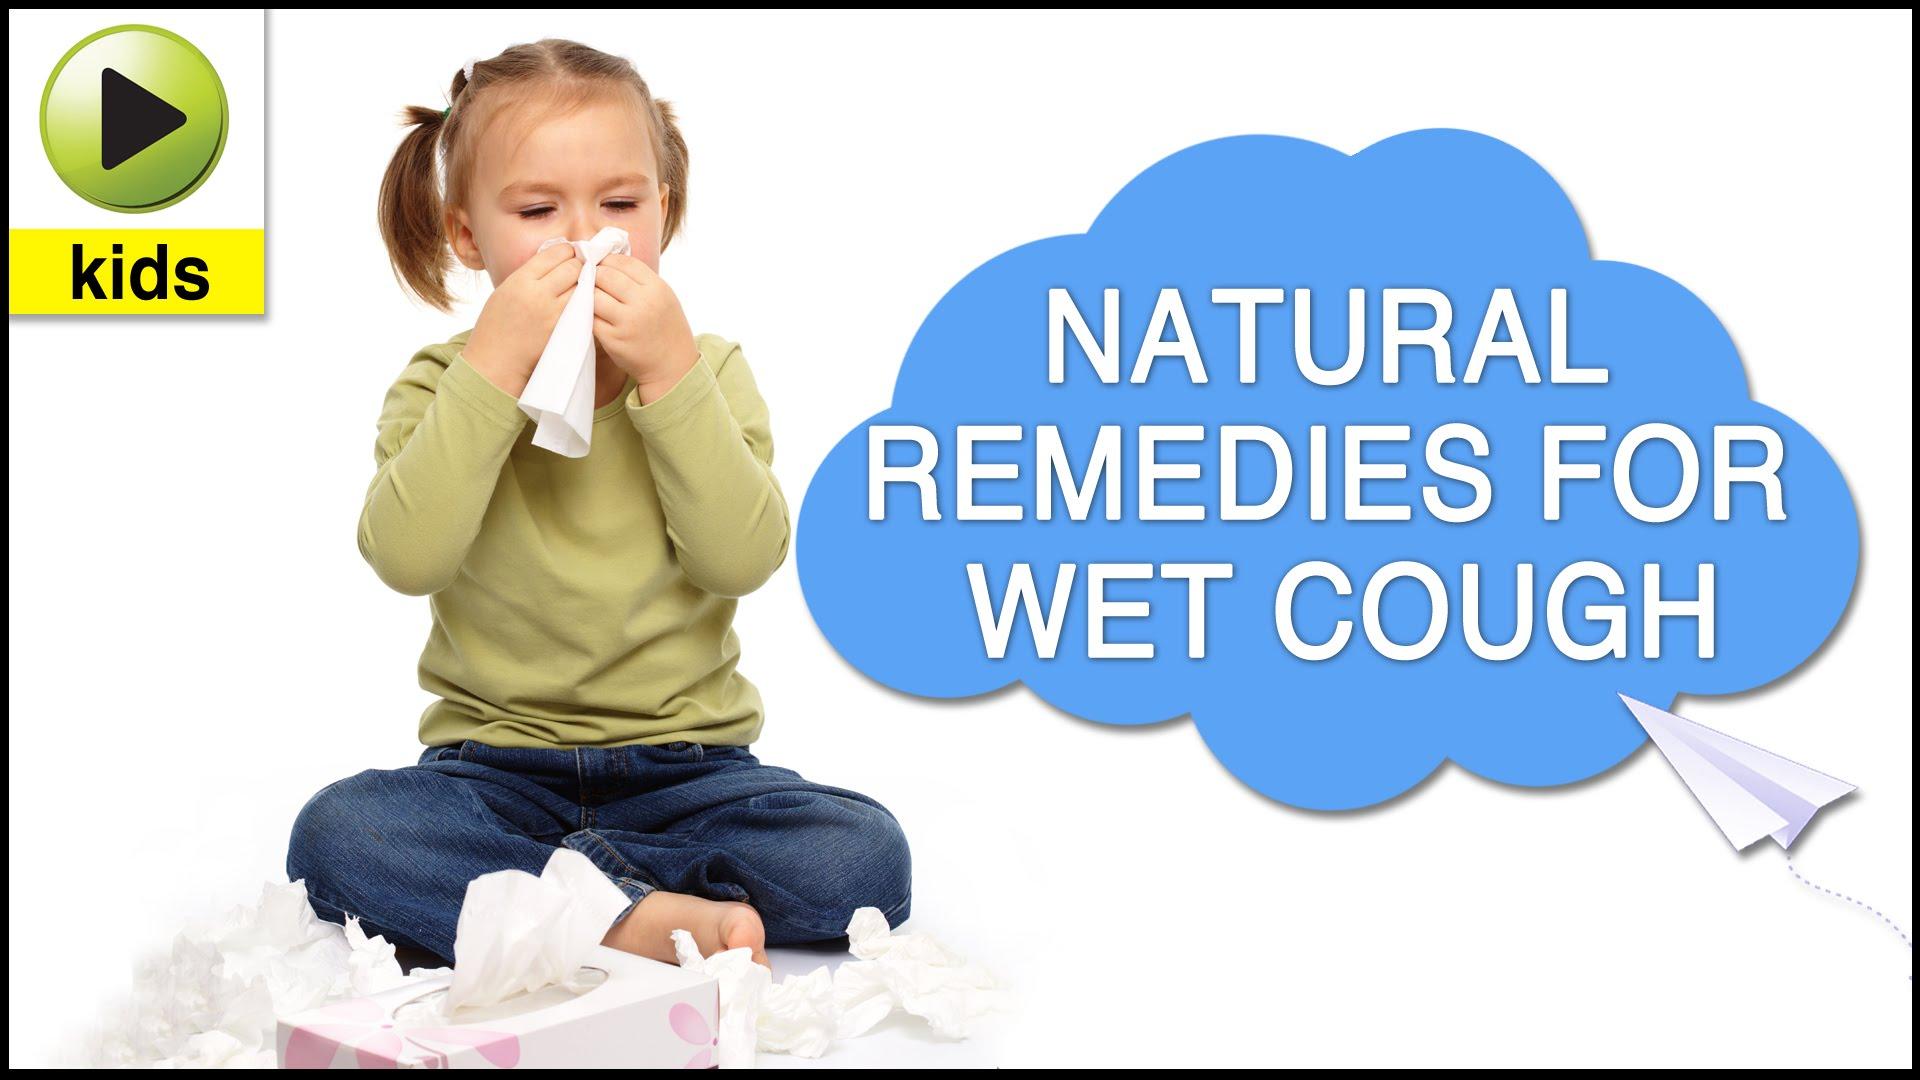 Cough Treatment in Children by Folk Remedies